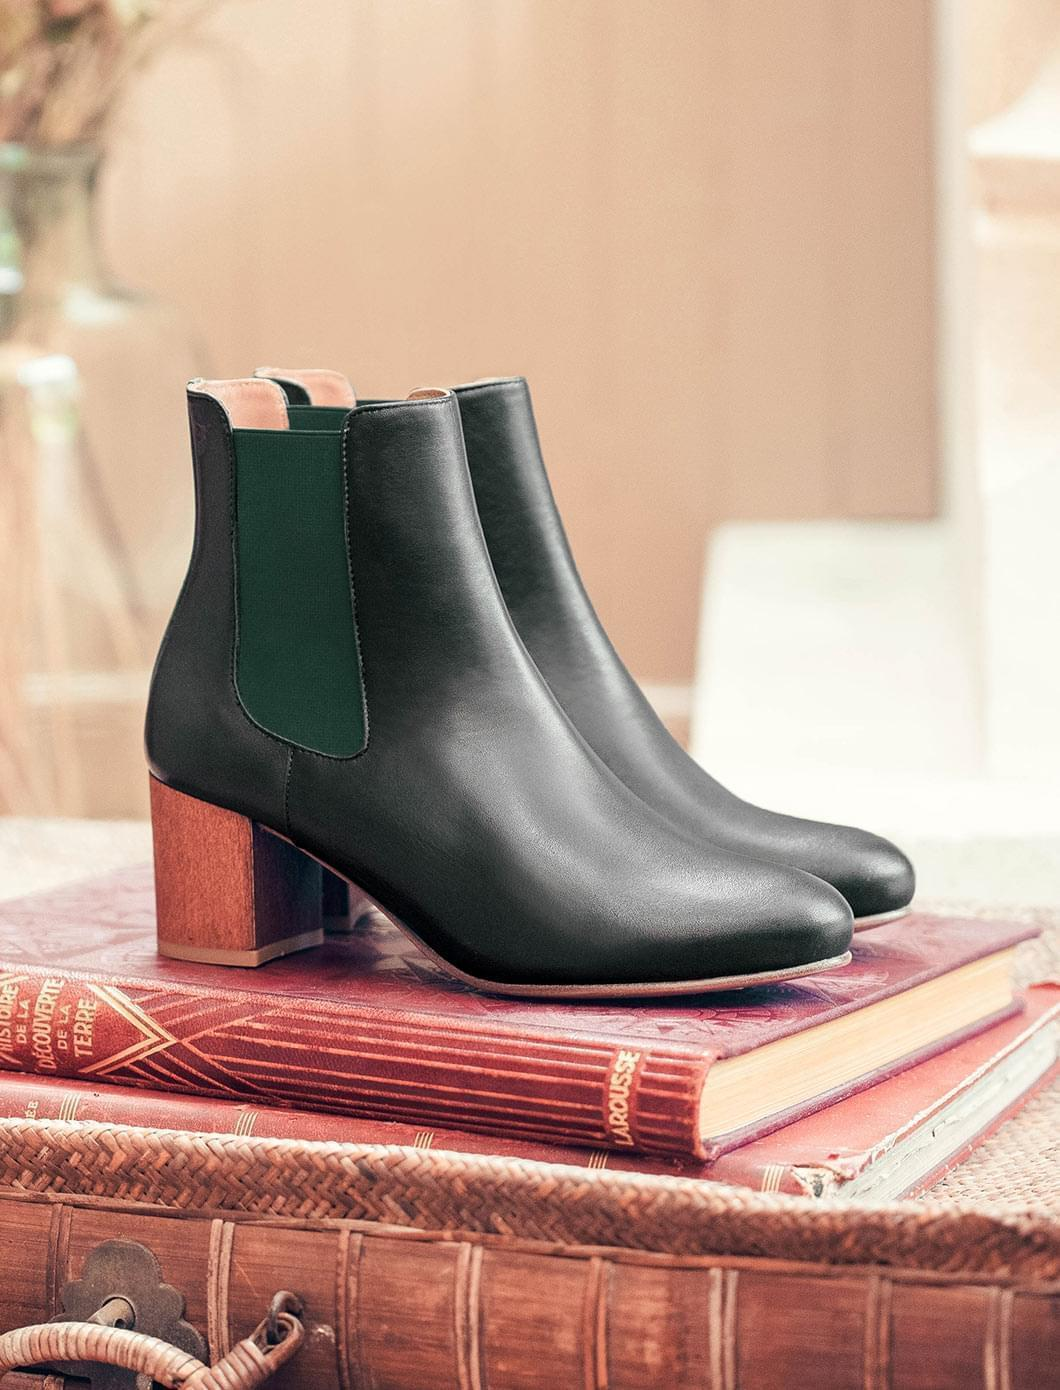 Chelsea heel - Black and green